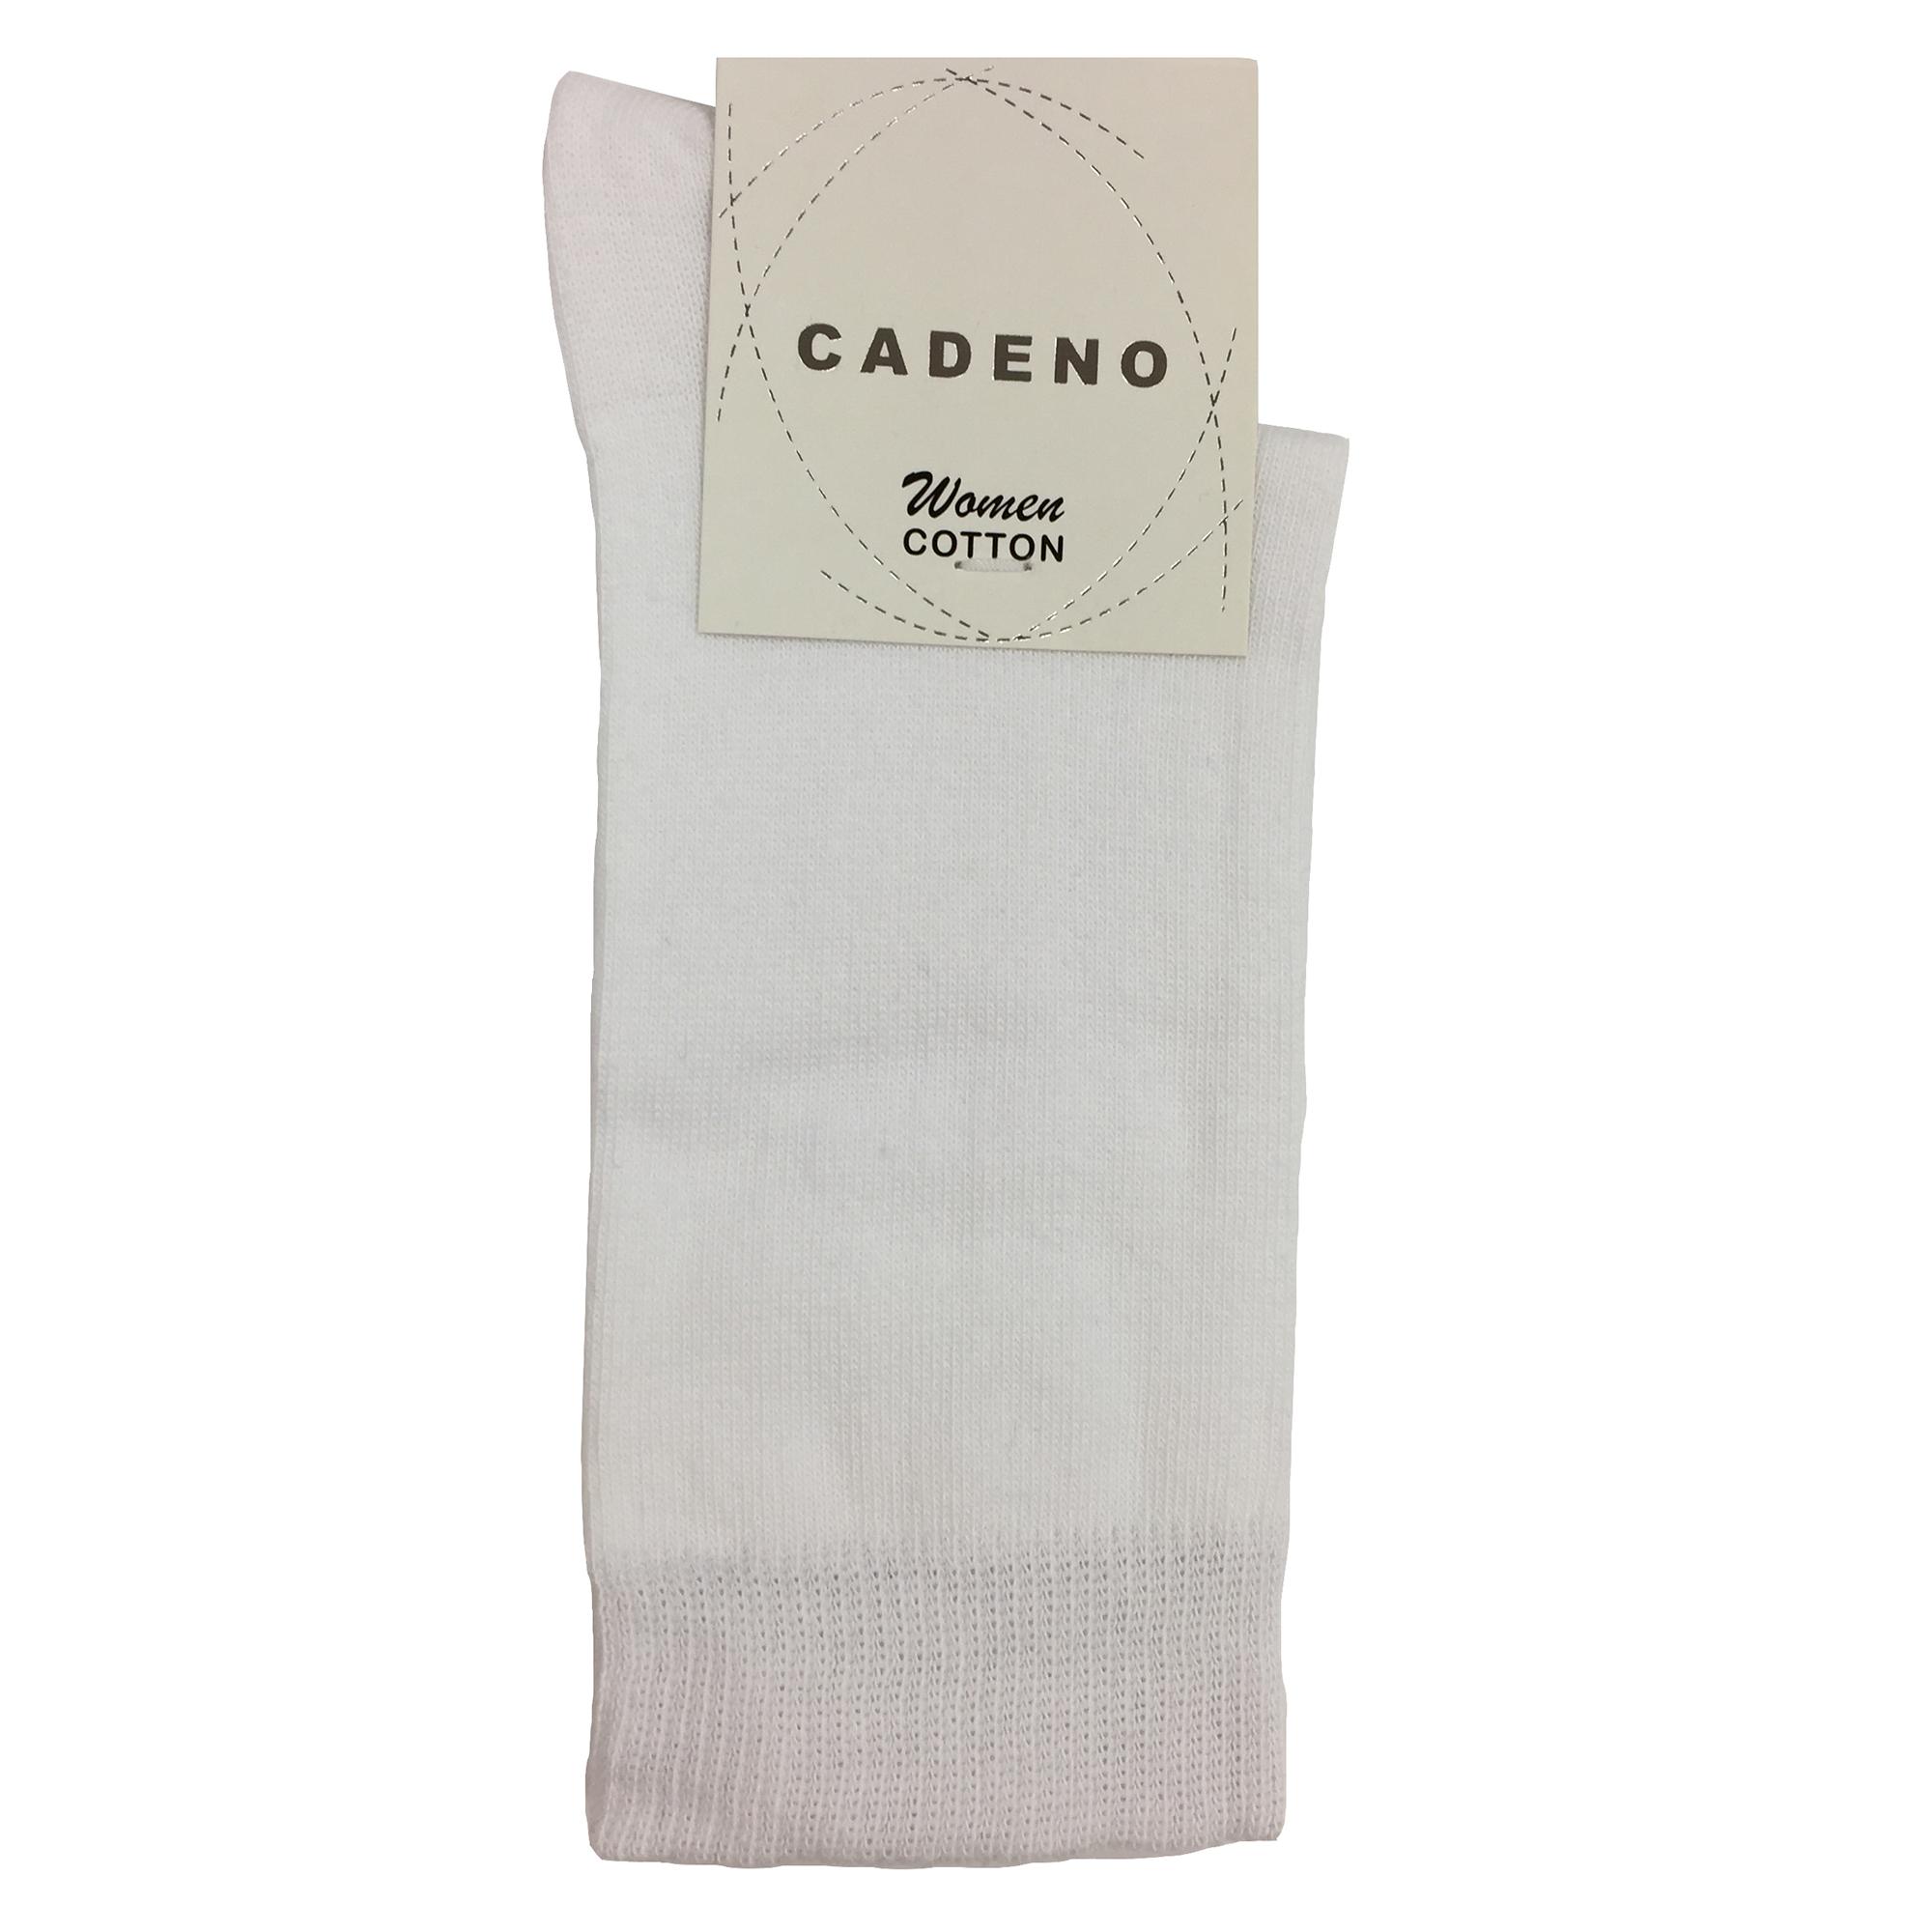 جوراب زنانه کادنو کد CAL1045 رنگ سفید بسته 3 عددی -  - 3